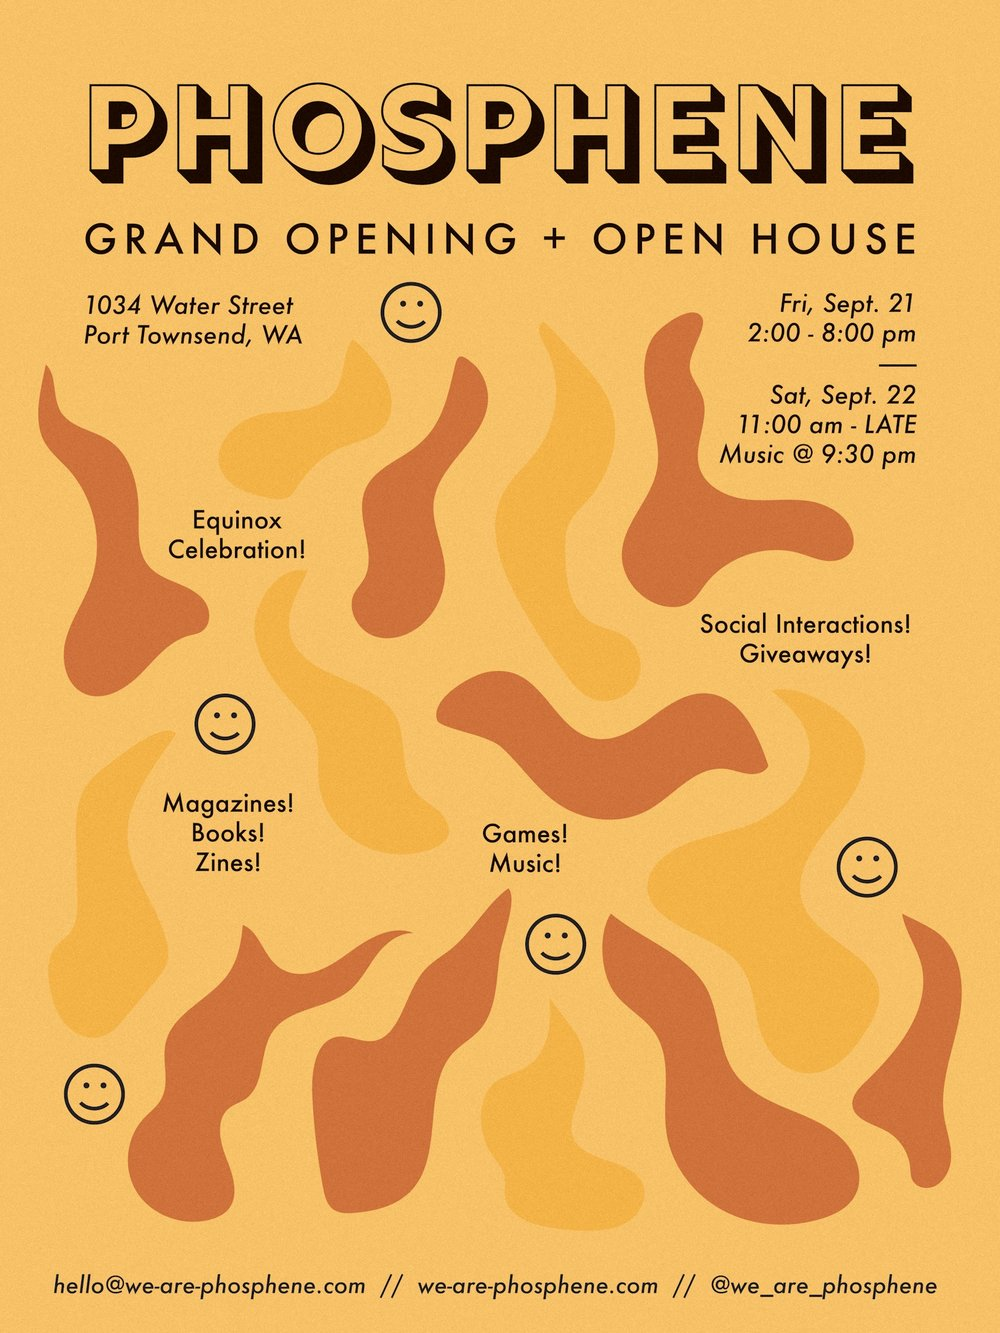 grand_opening_poster grainy.JPG